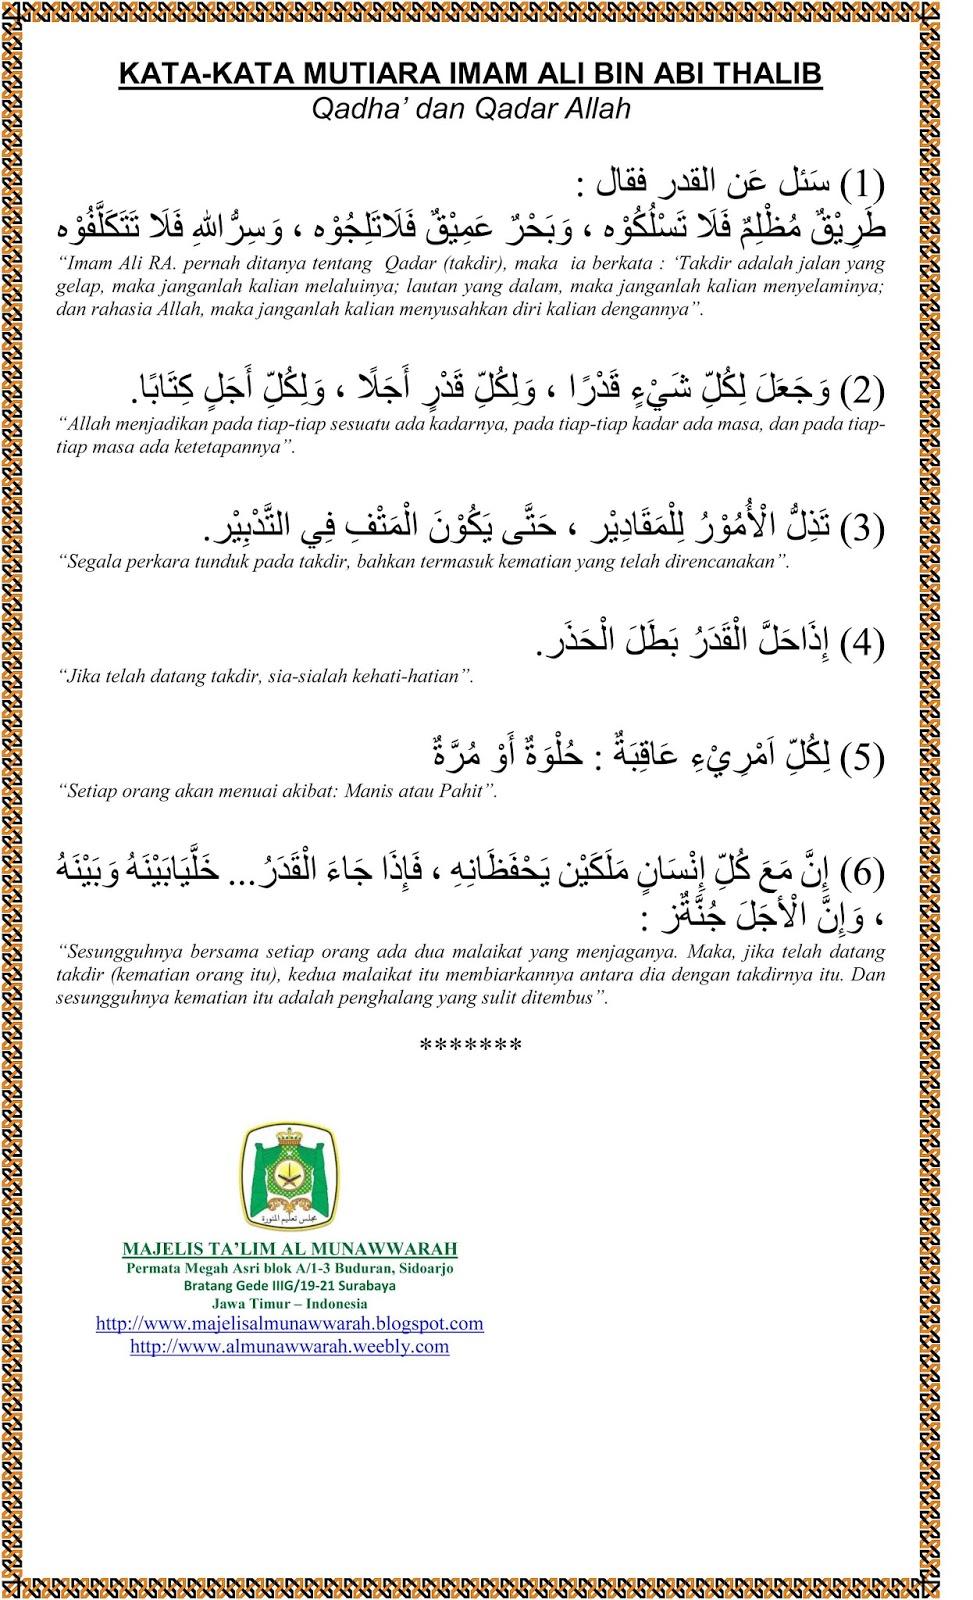 Qadha Dan Qadar Allah Kata Kata Mutiara Imam Ali Bin Abi Thalib